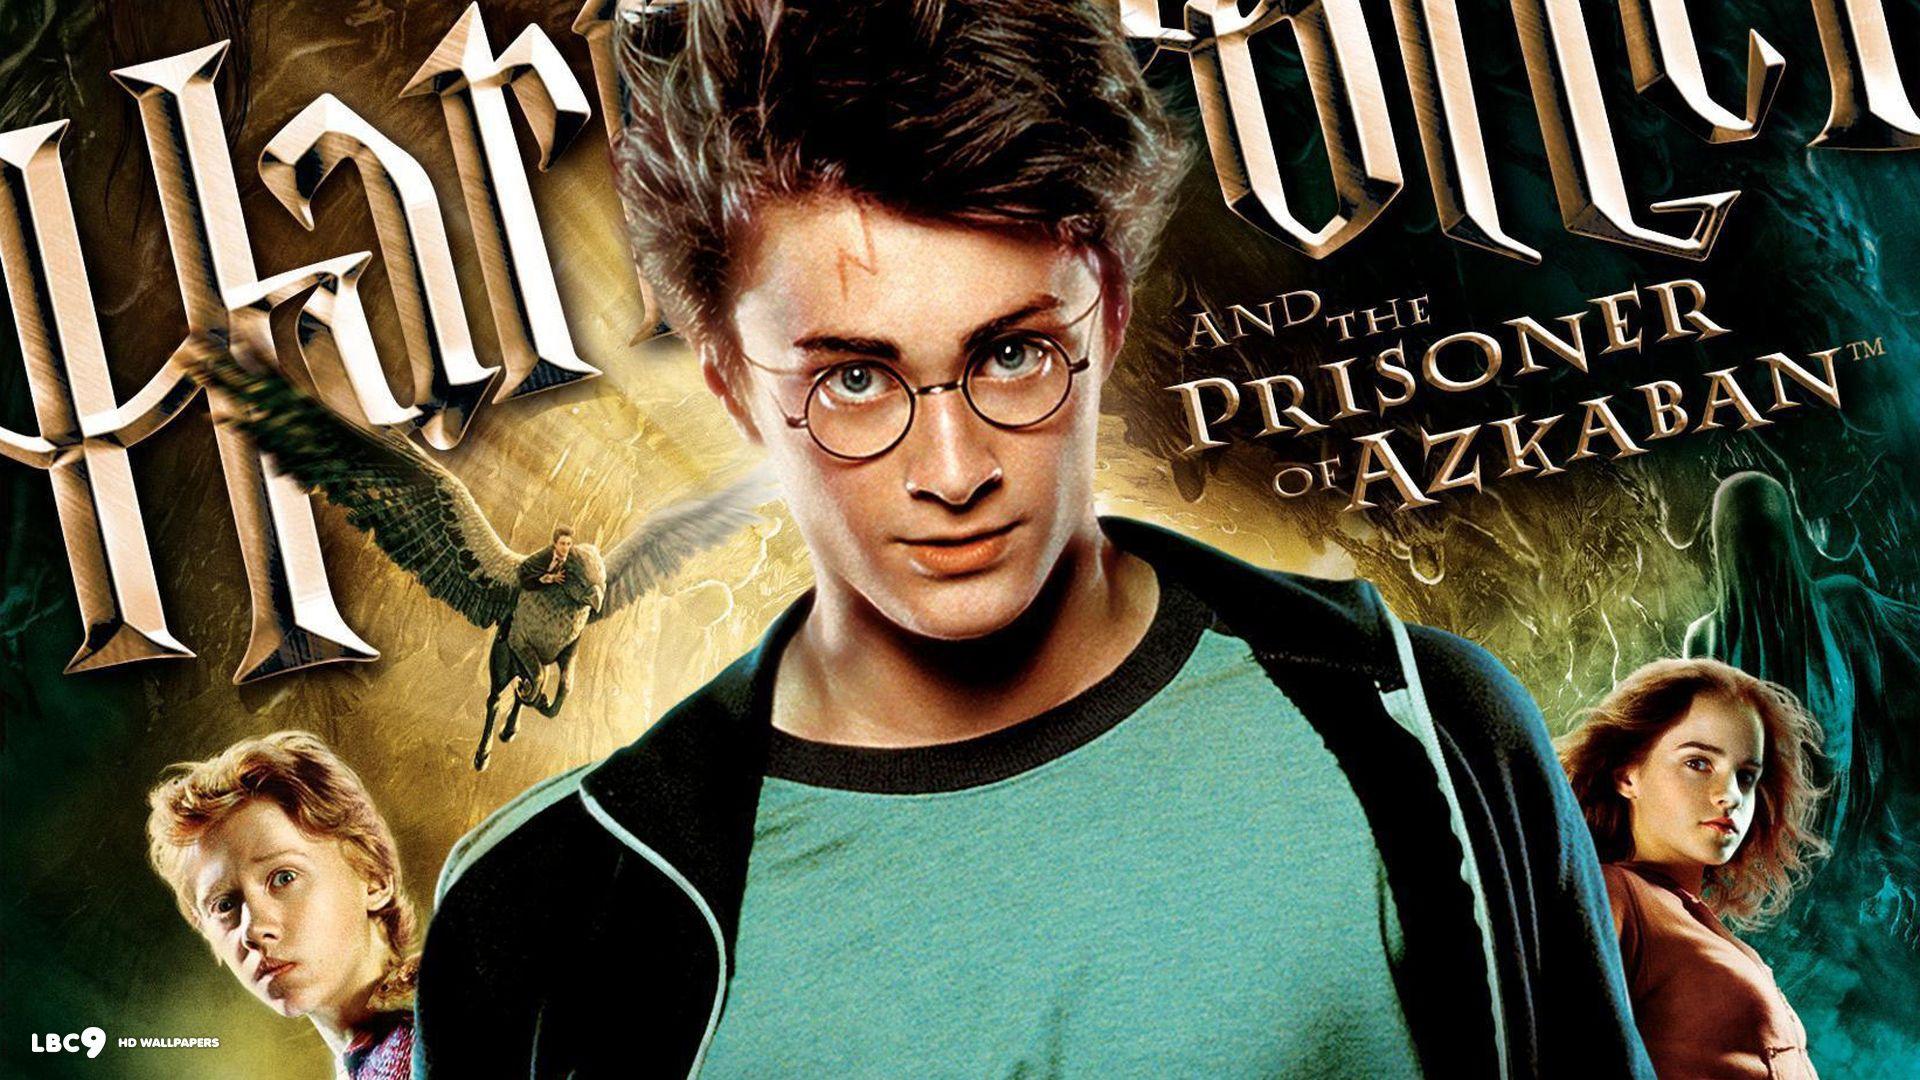 Pin By Anup Tiwari On Harry Potter Generation Prisoner Of Azkaban The Prisoner Of Azkaban Prisoner Of Azkaban Book